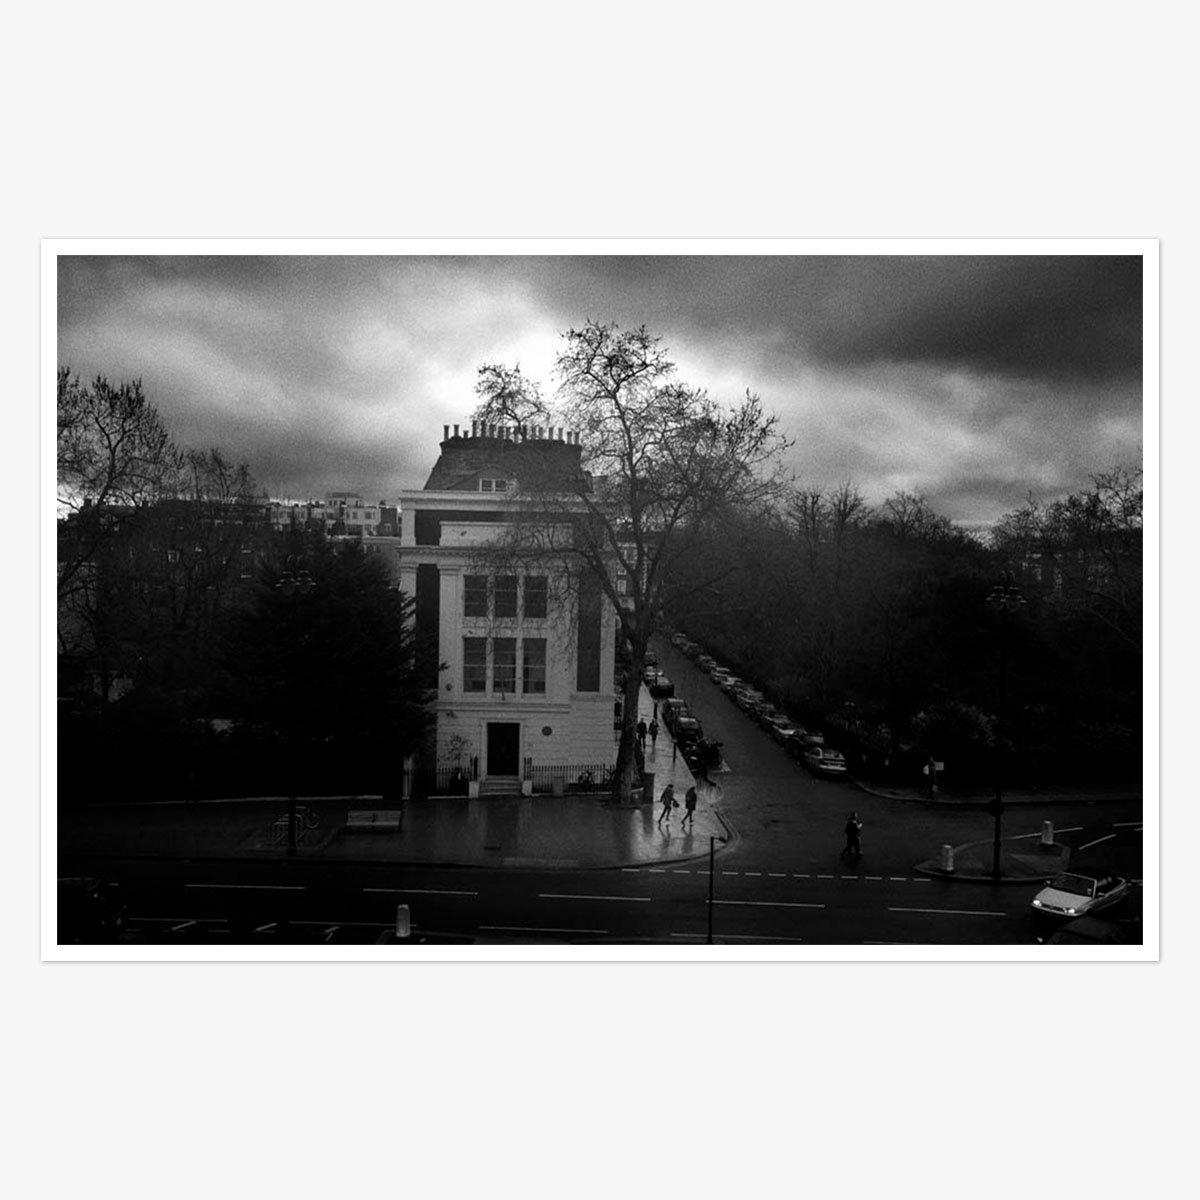 London in the Rain by Brian Harris